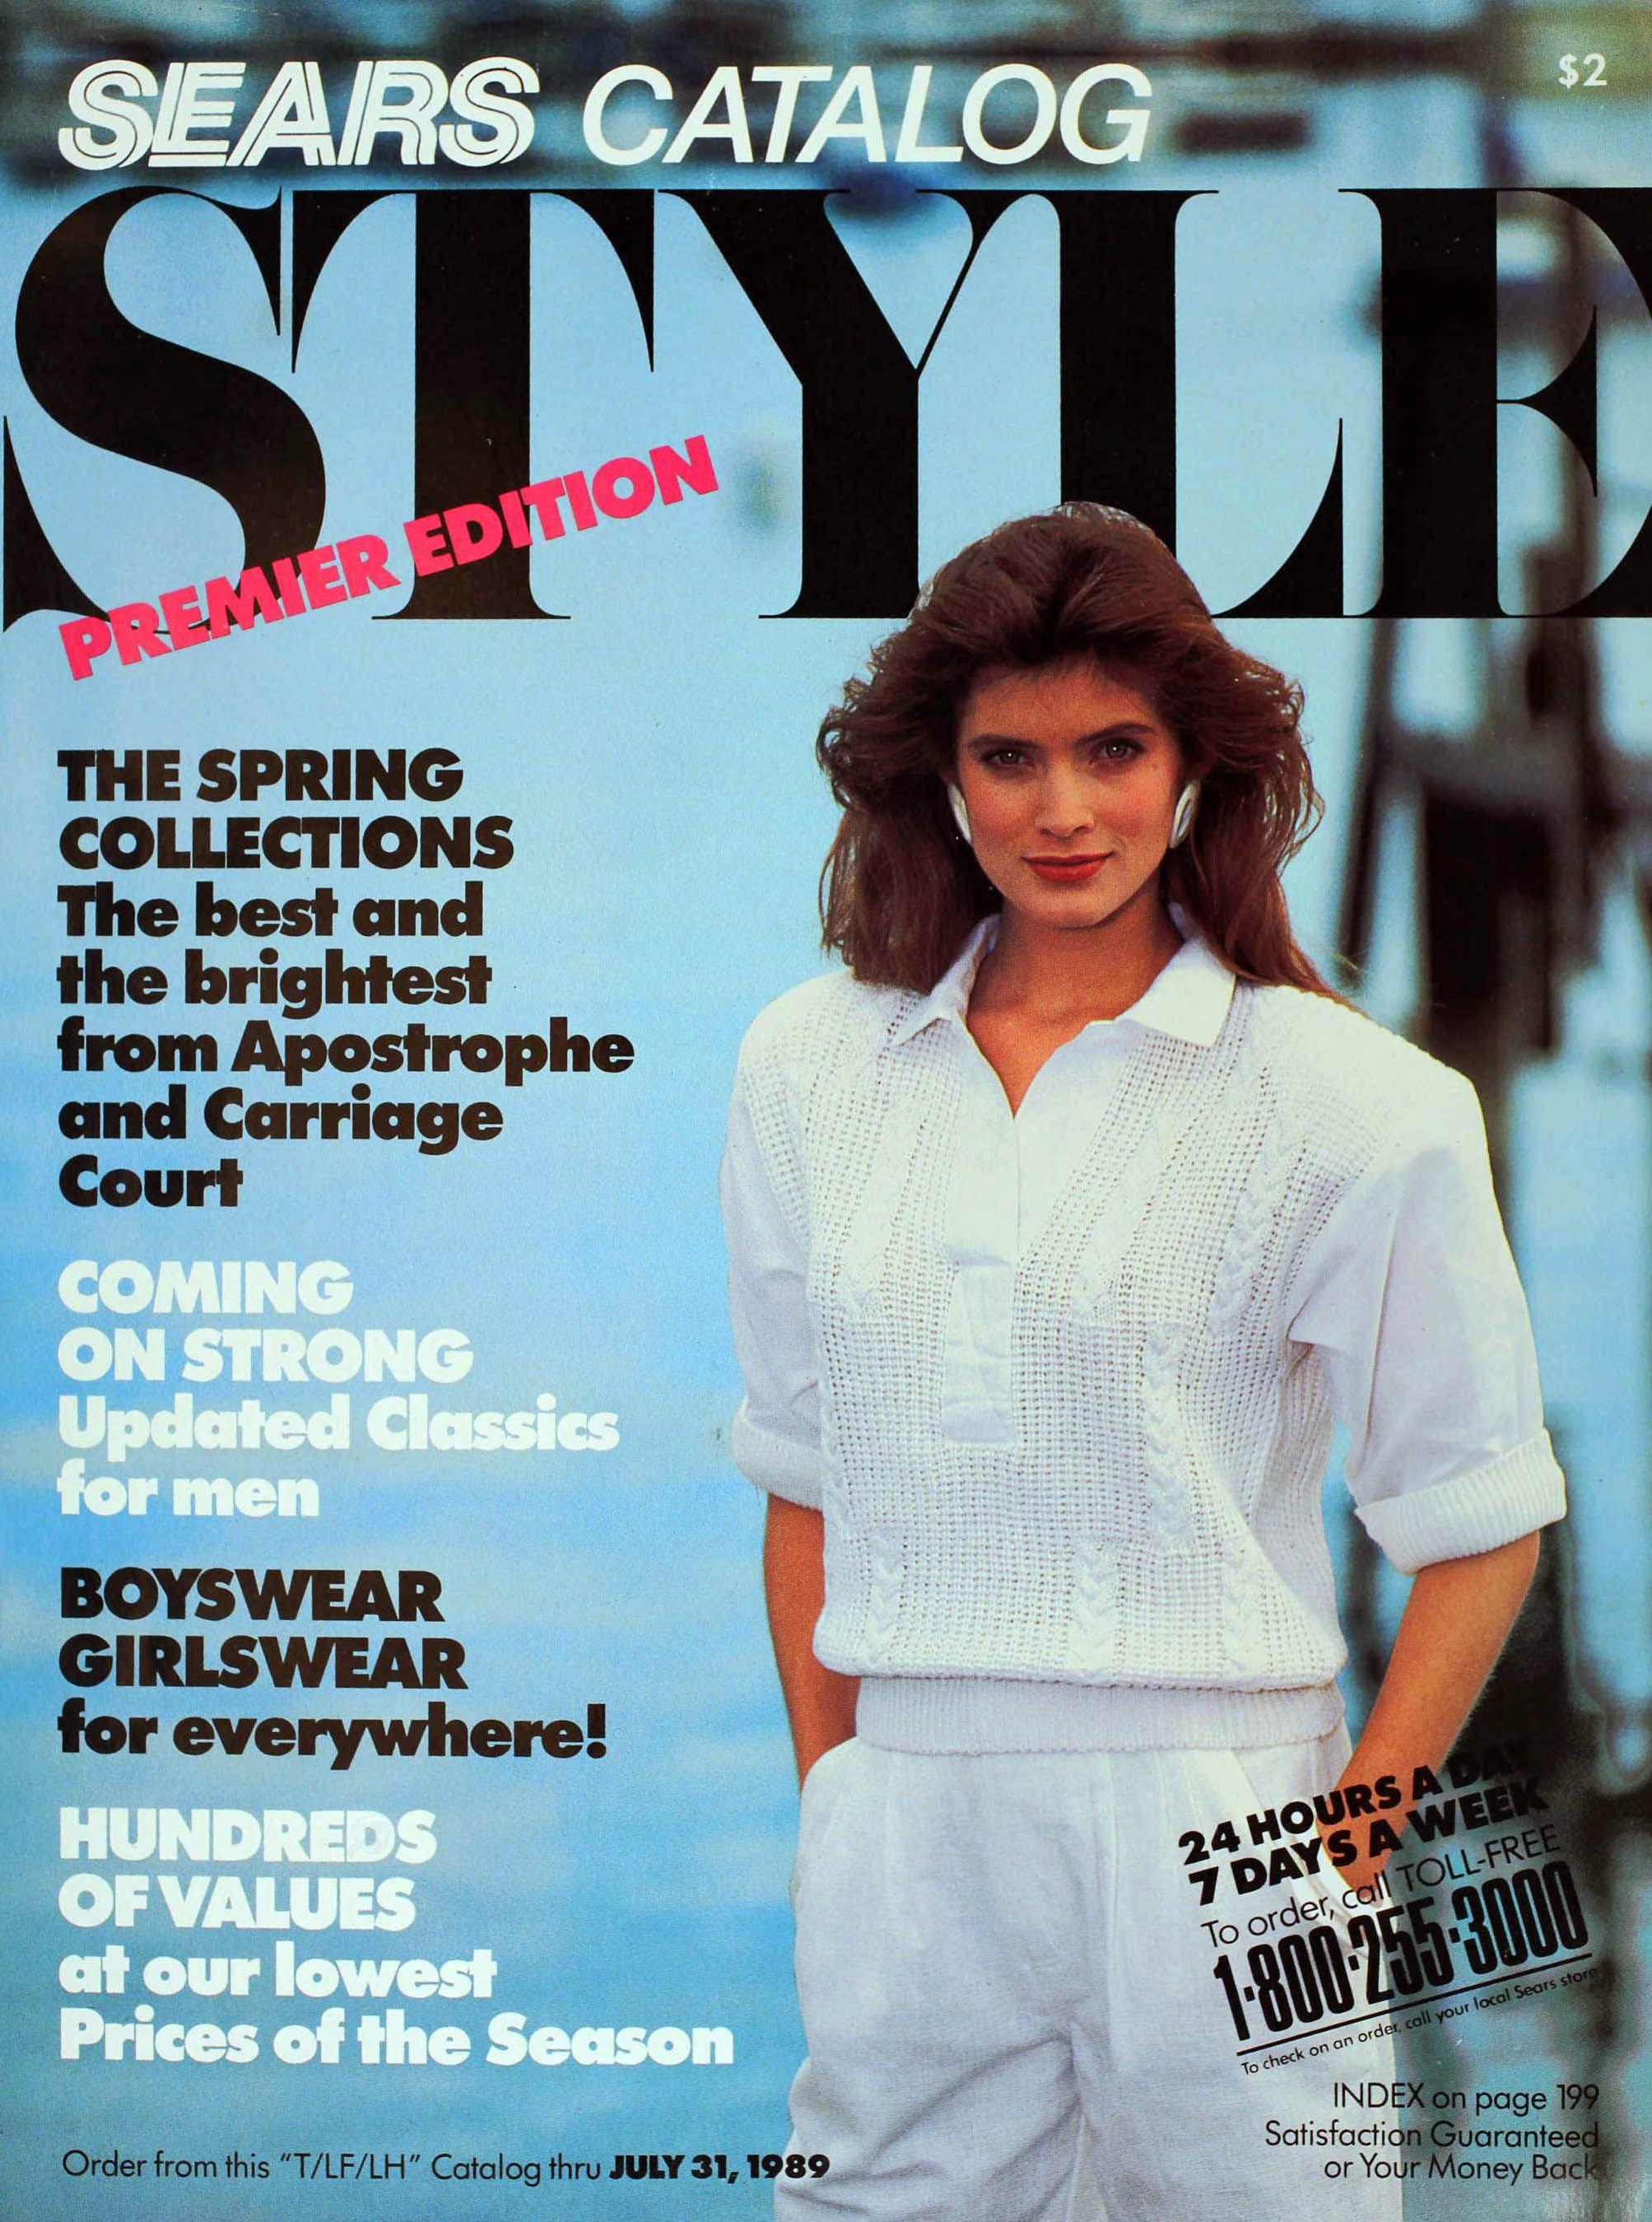 Sears Christmas Catalog 2020 1989 Sears STYLE Catalog in 2020 | Christmas catalogs, Sears